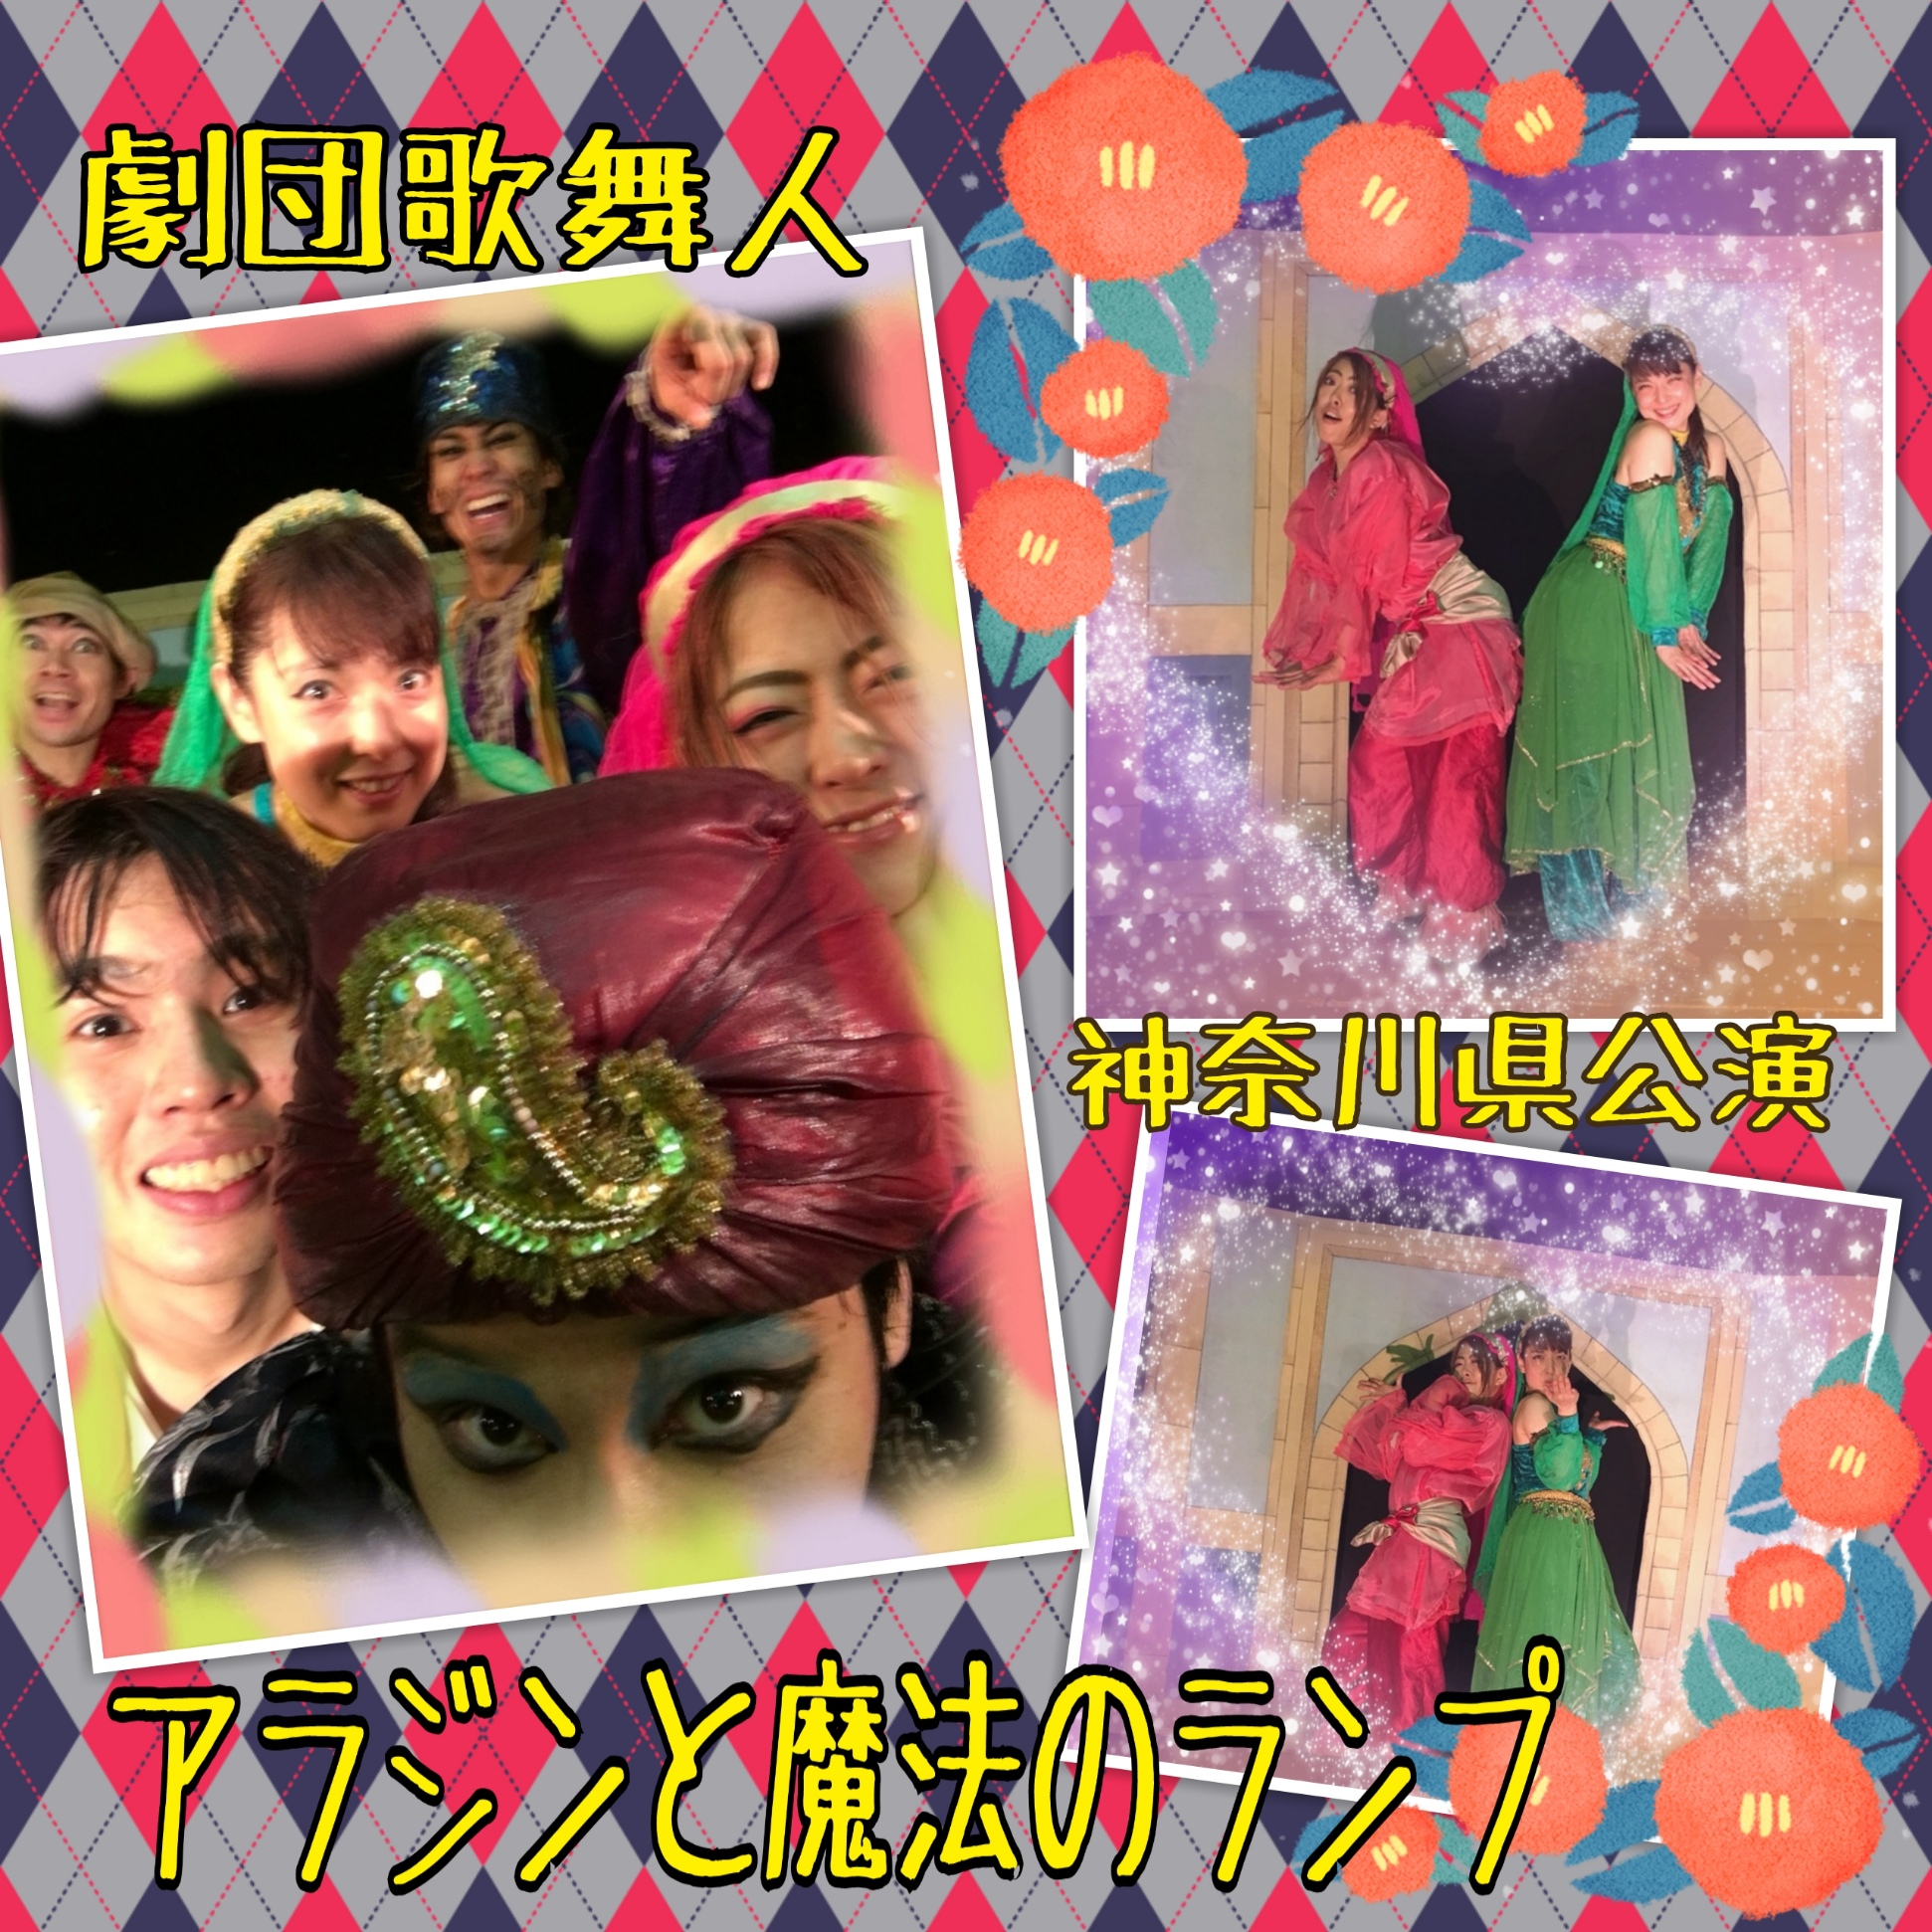 moblog_04db91d6.jpg